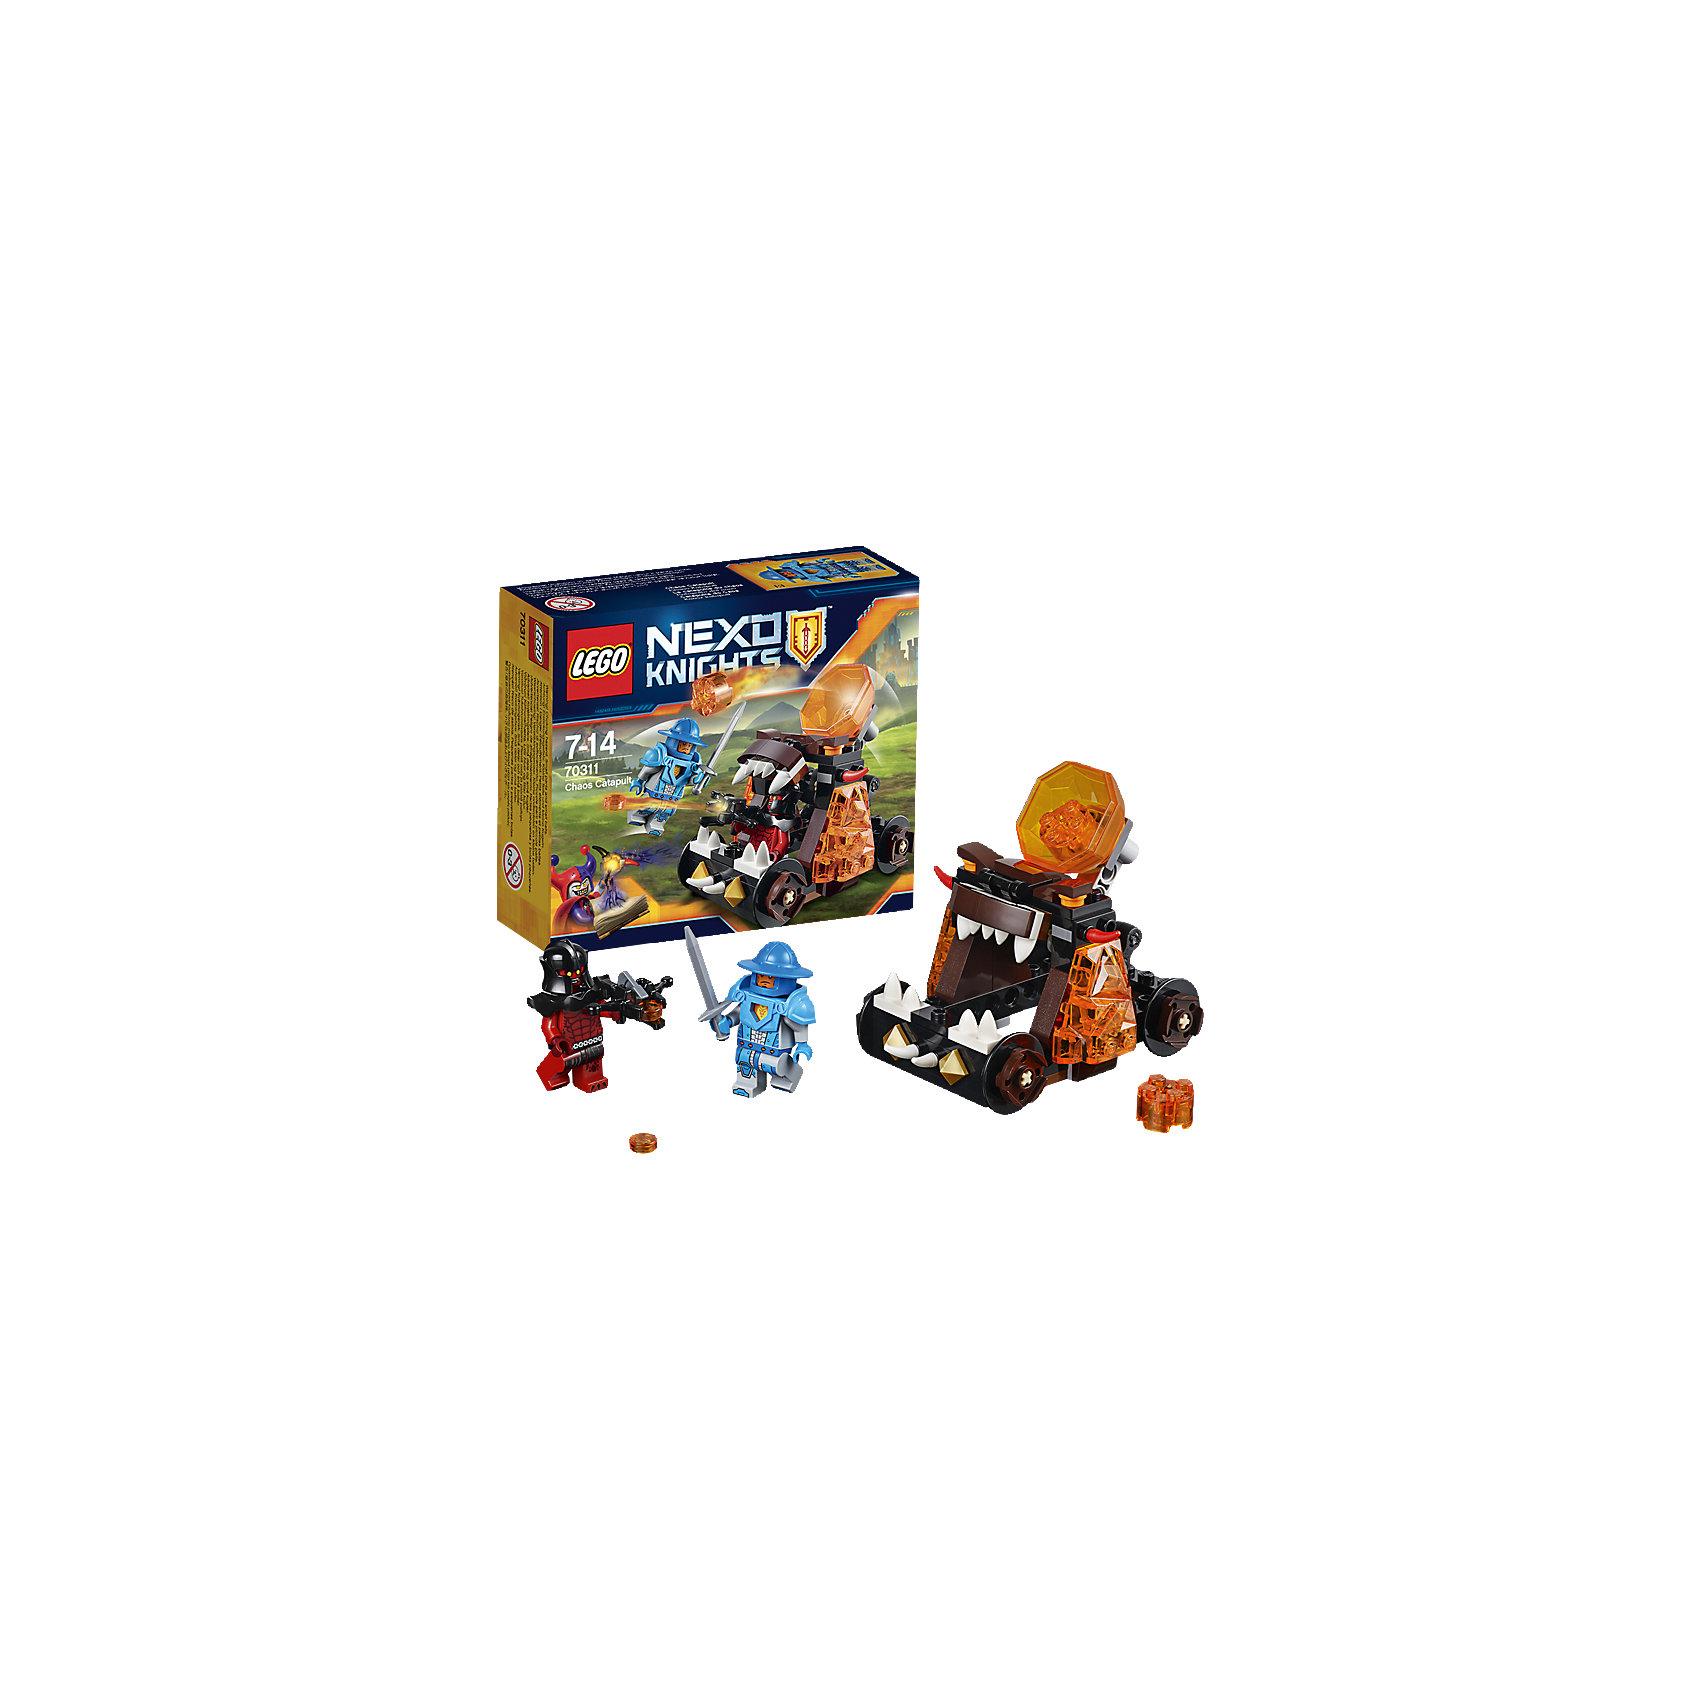 LEGO NEXO KNIGHTS 70311: Безумная катапульта